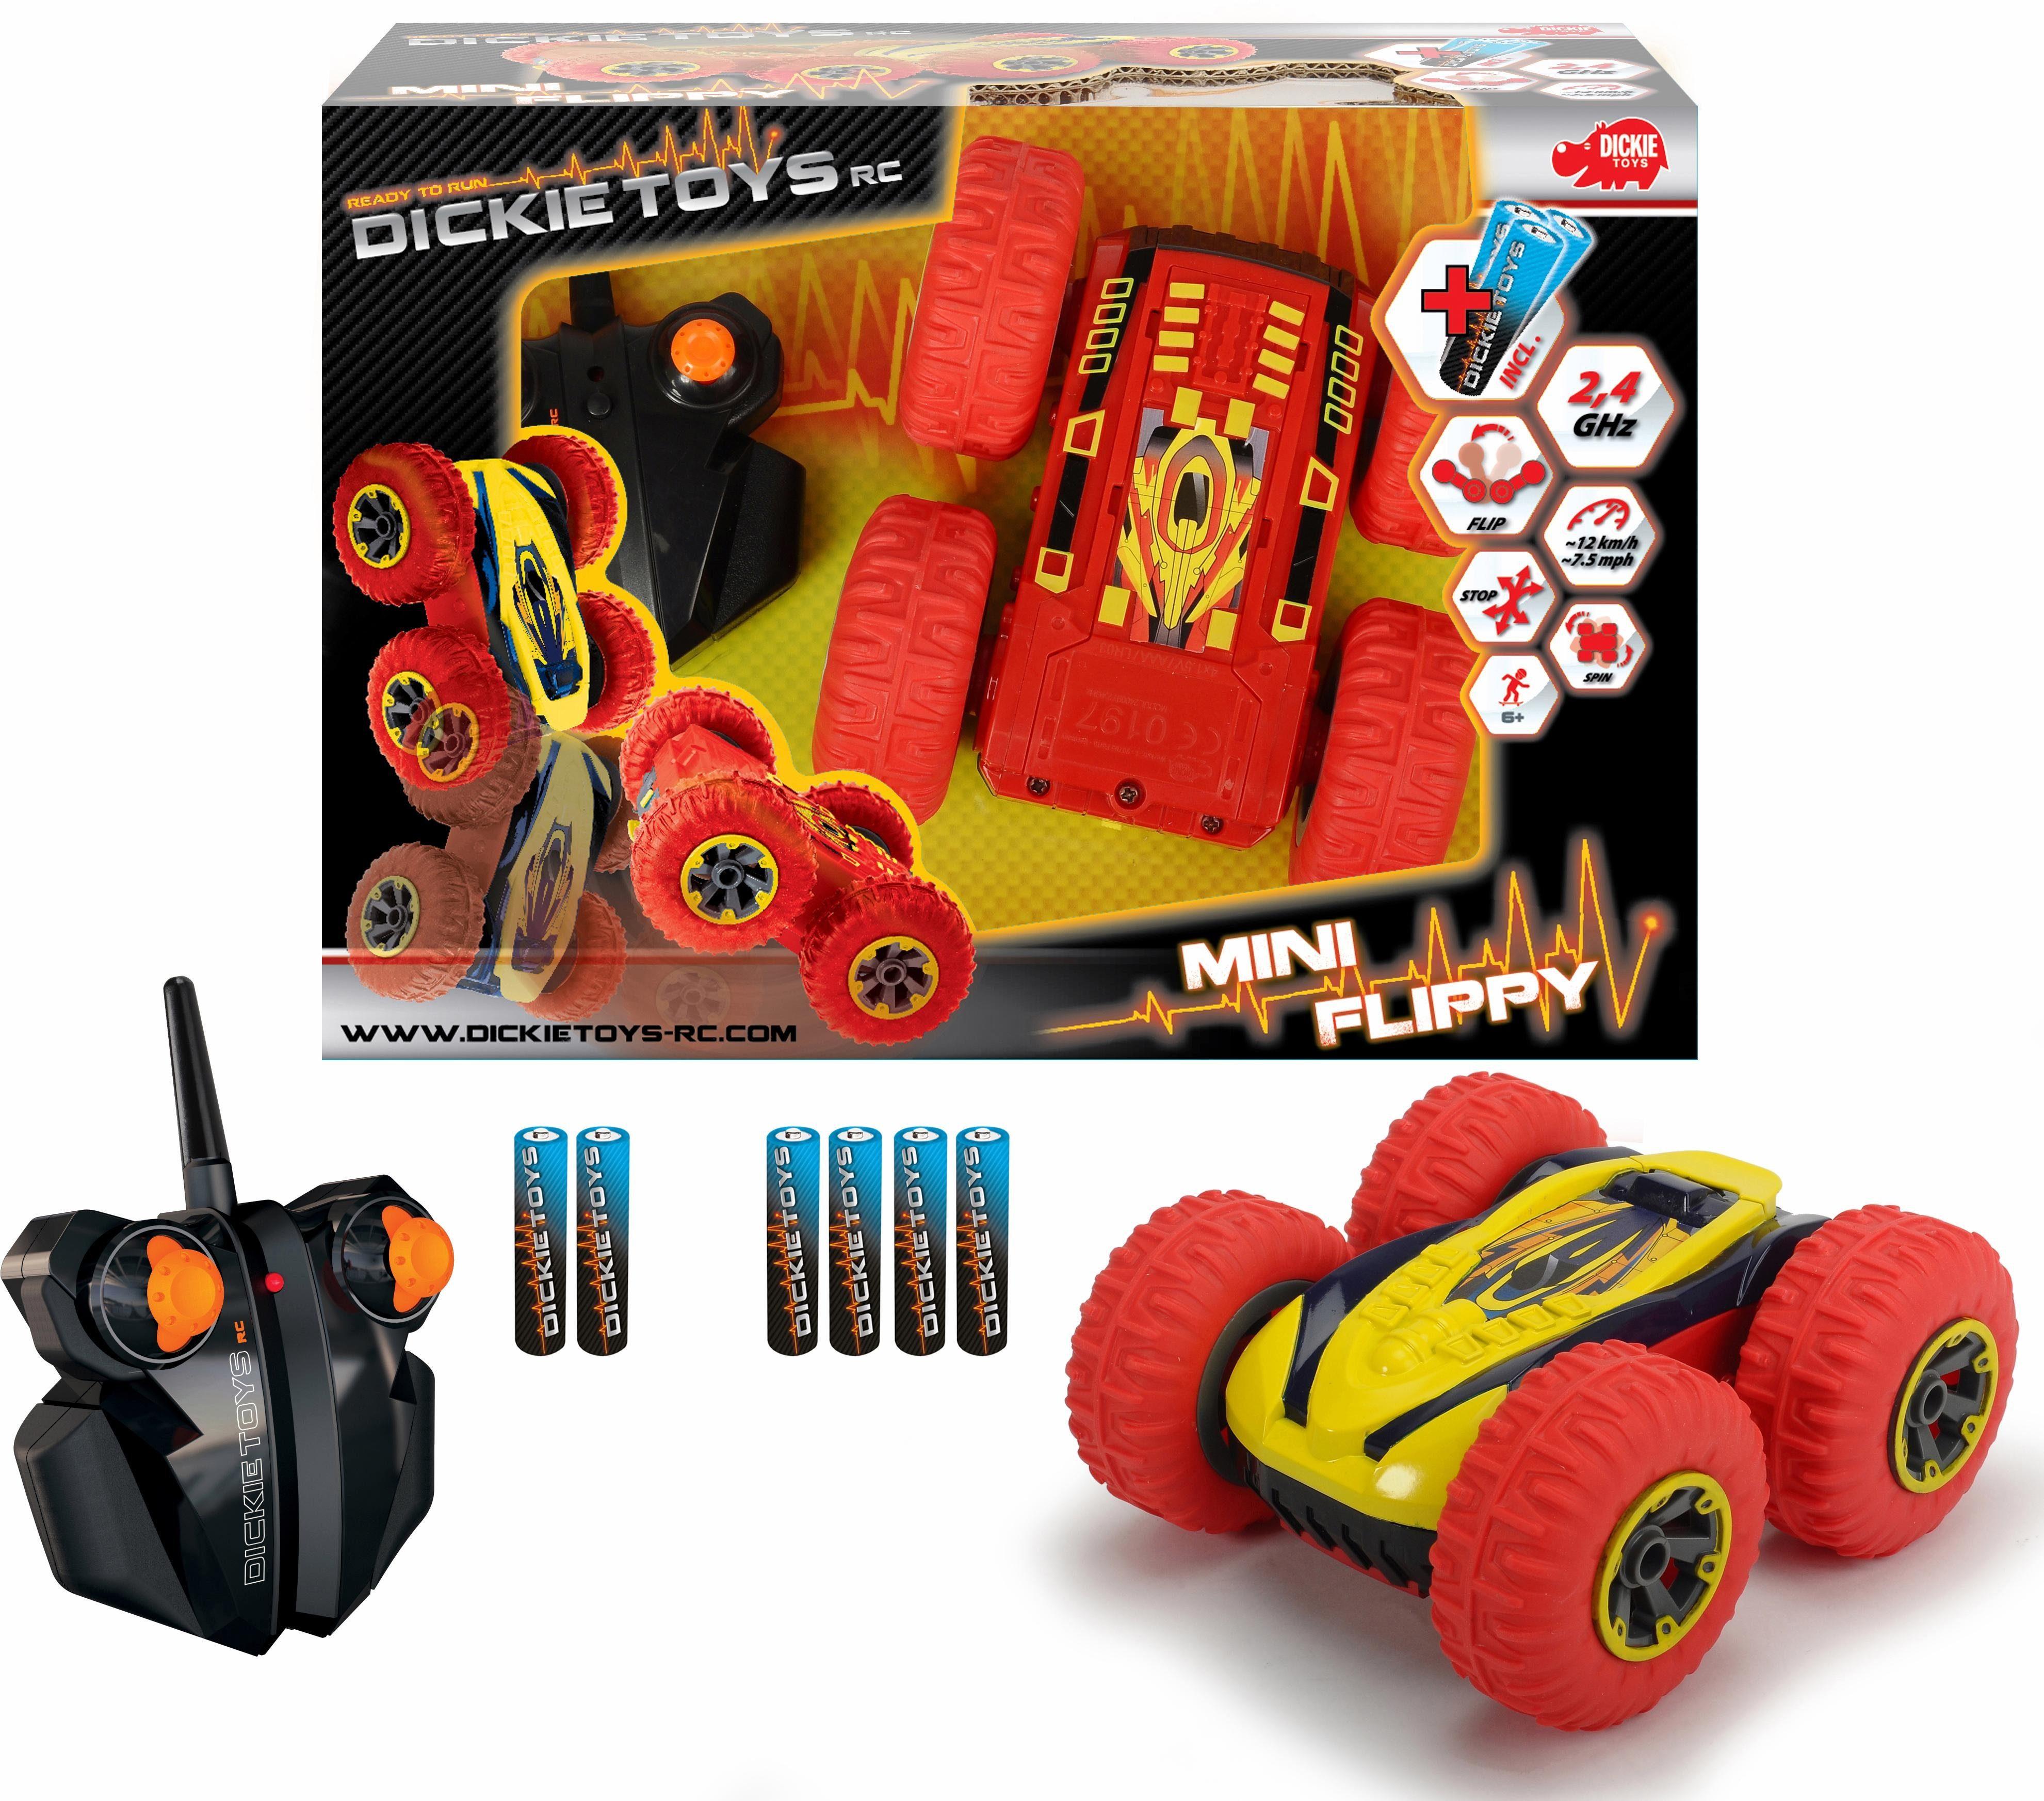 Dickie Toys RC Komplettset, »RC Mini Flippy«